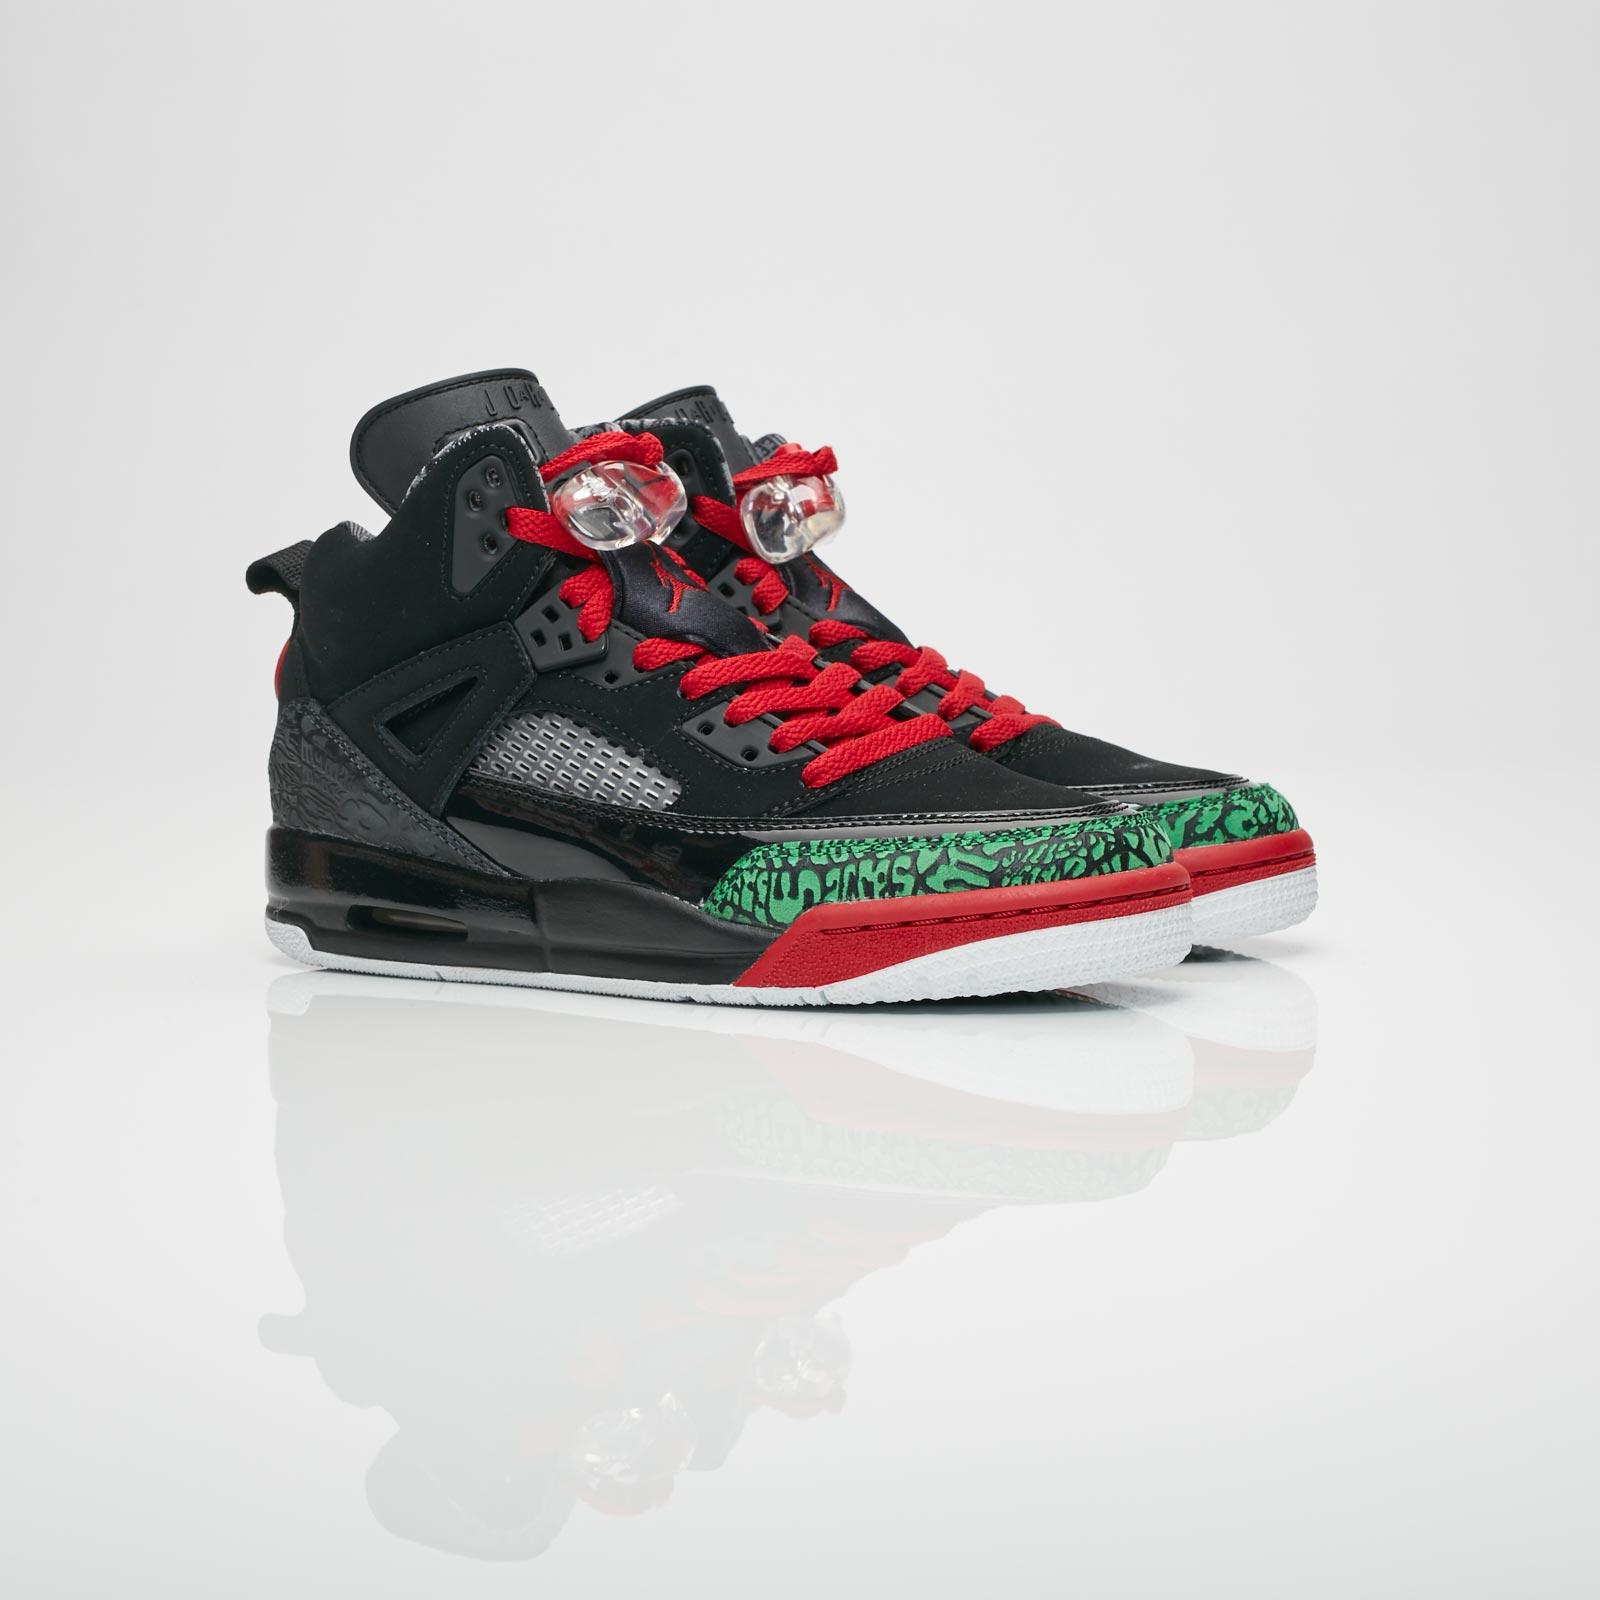 finest selection 5d22e 6a75e Jordan Brand Jordan Spizike (GS)